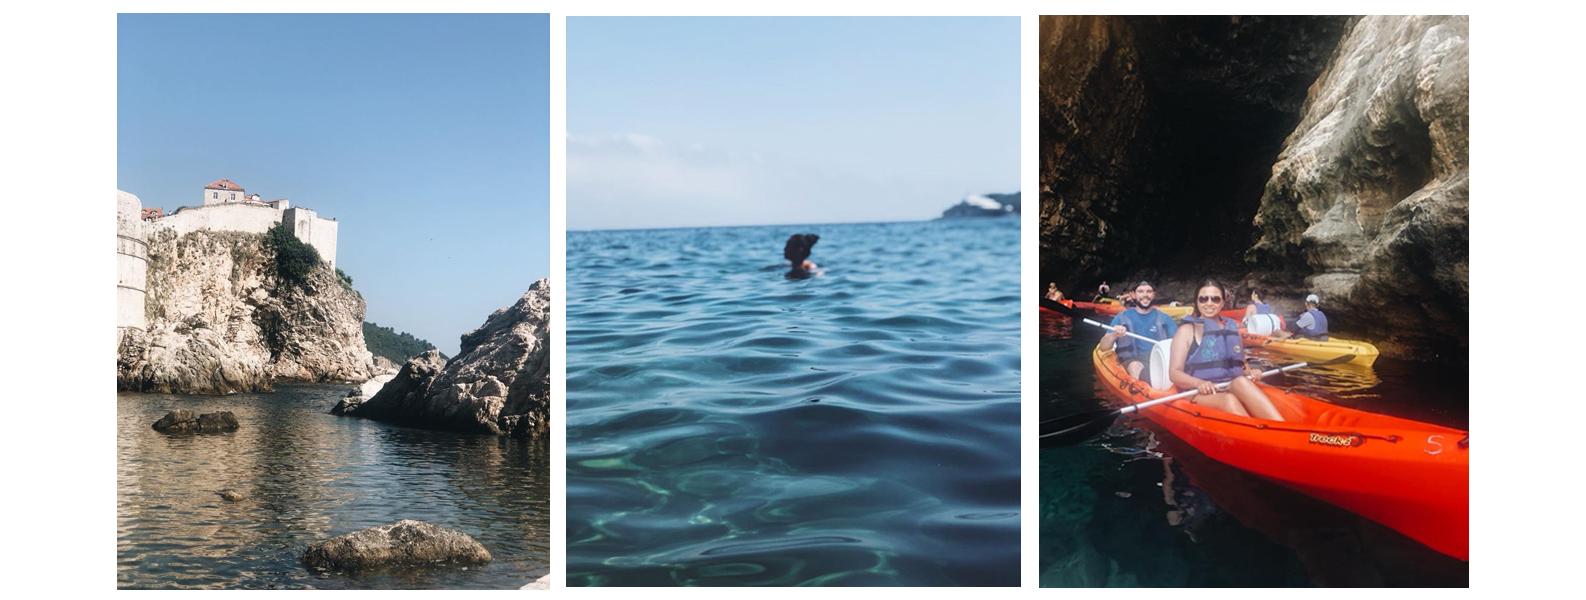 Blog Croatia karrisaloves College Hill Trip To Anywhere